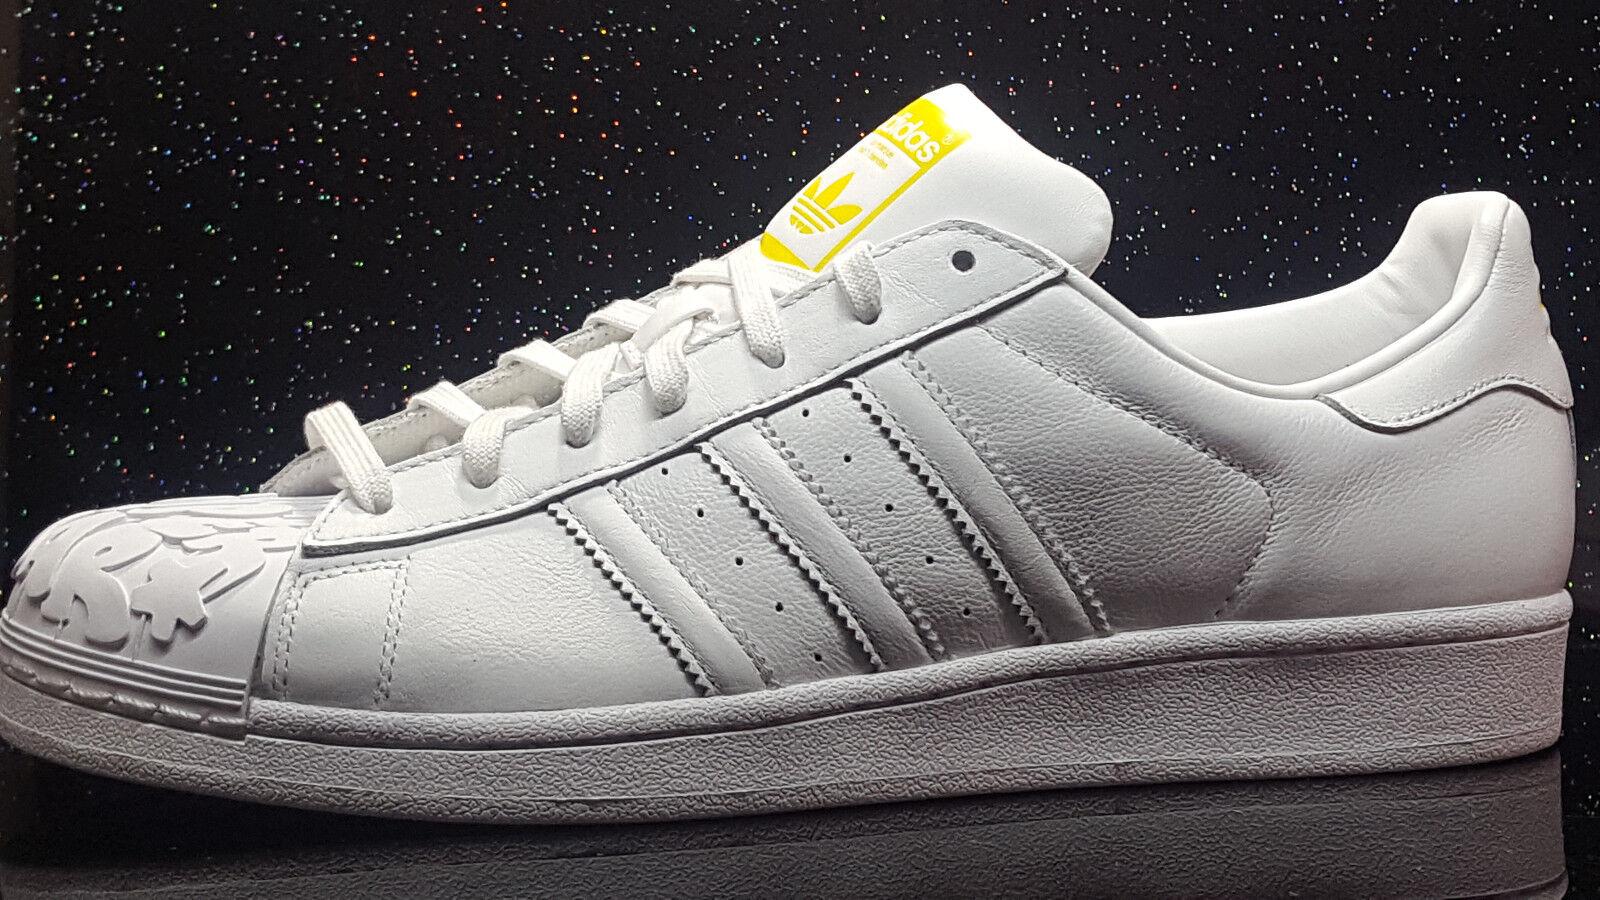 ADIDAS Superstar NEU Gr.46,5 sneaker freizeit schuhe top adidas lauf sport